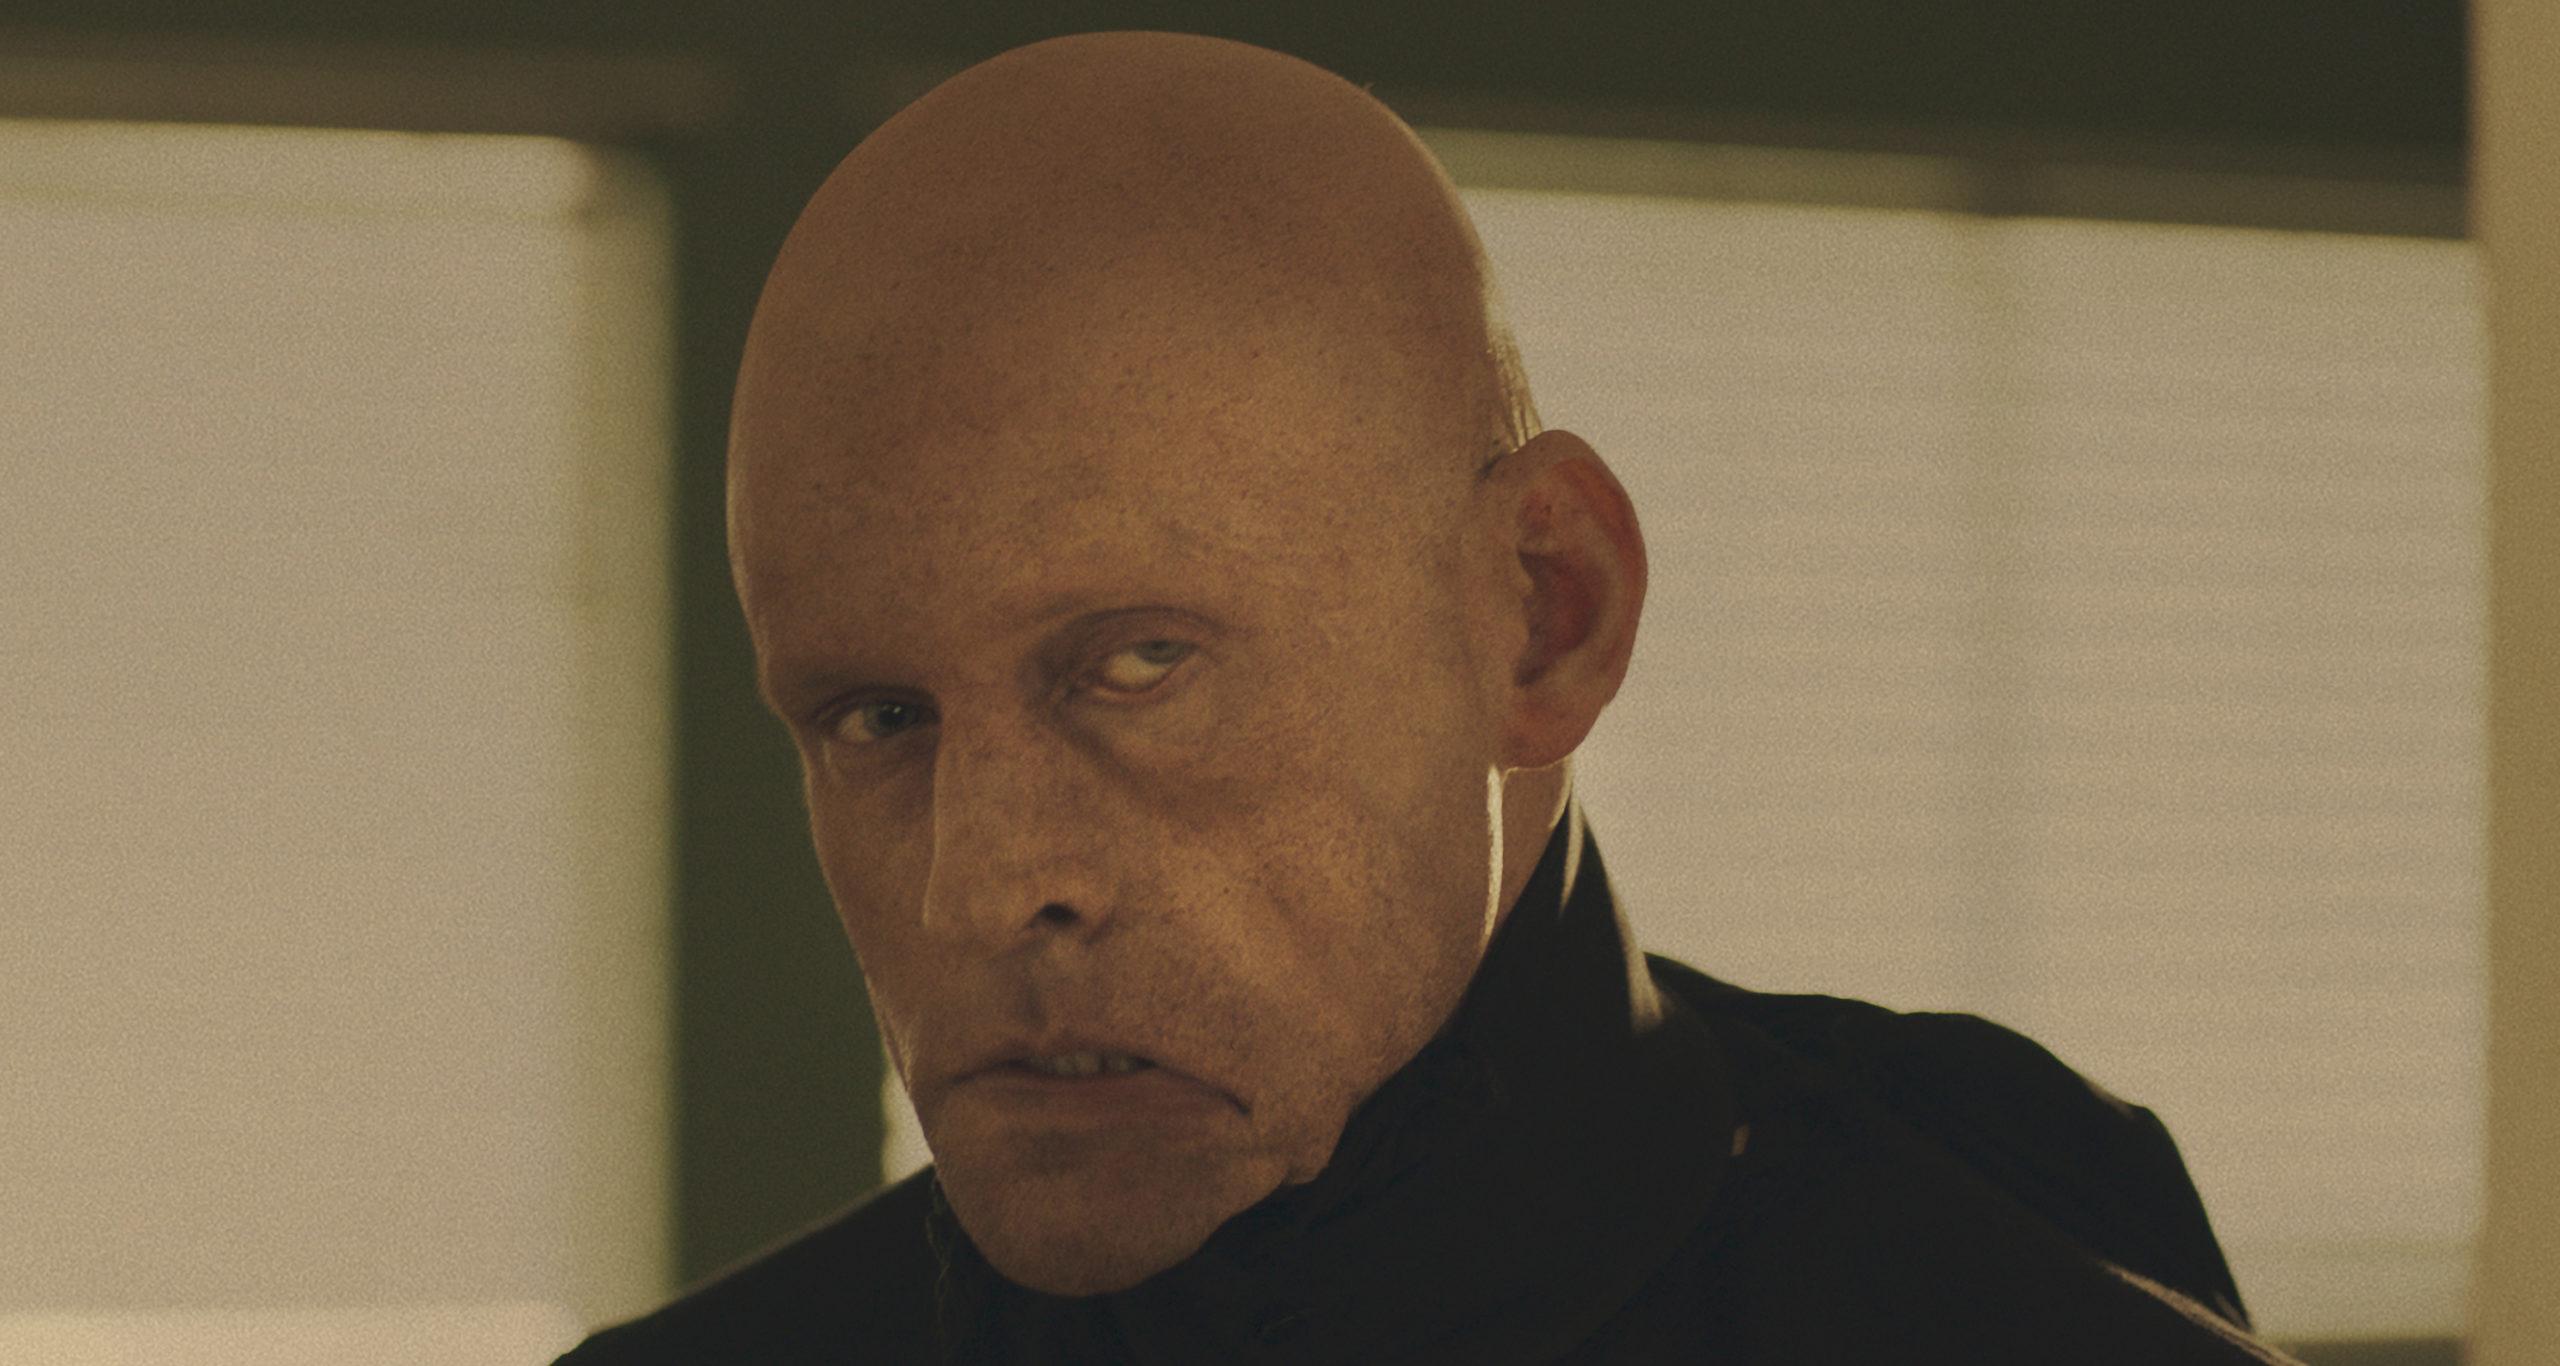 Smiley Face Killers - Brett Easton Ellis scripts a brutal serial killer movie....